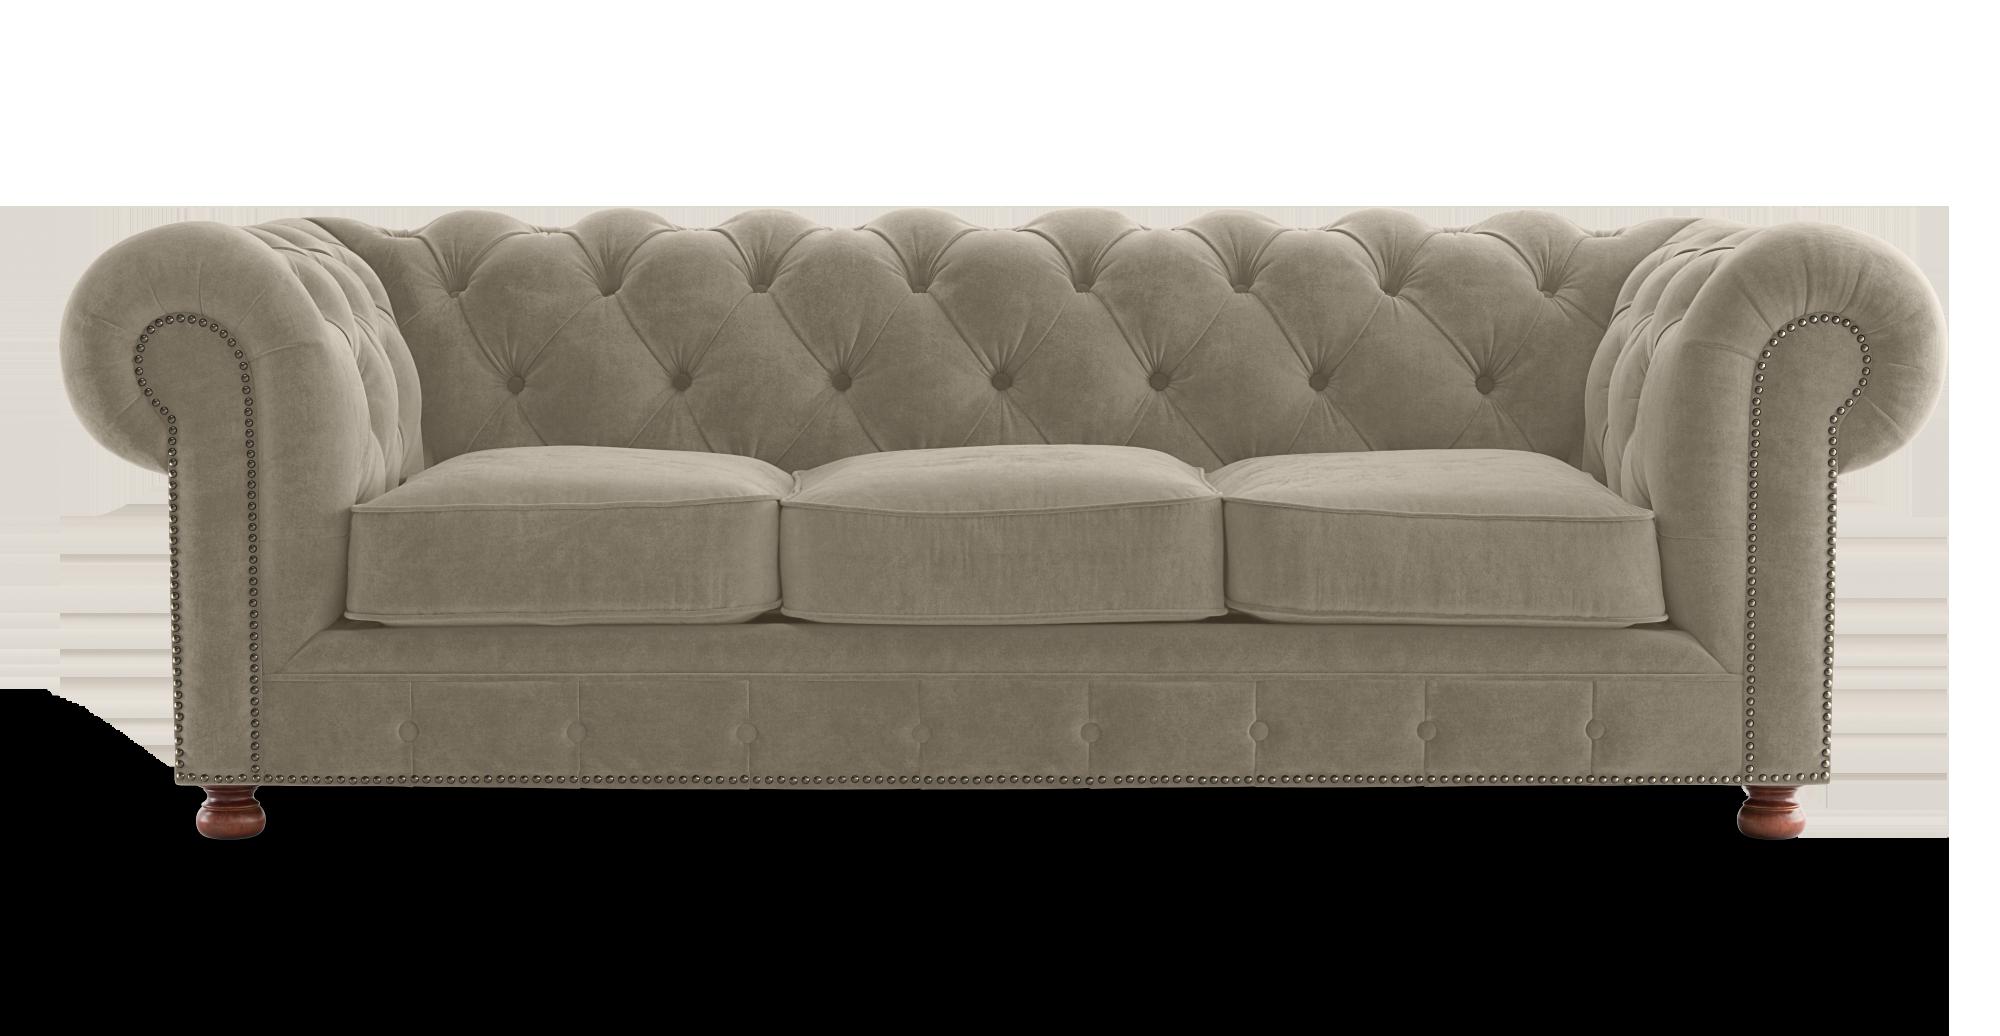 Remarkable Notting Hill Velvet Chesterfield 3 5 Seater Sofa Bed In 2019 Customarchery Wood Chair Design Ideas Customarcherynet